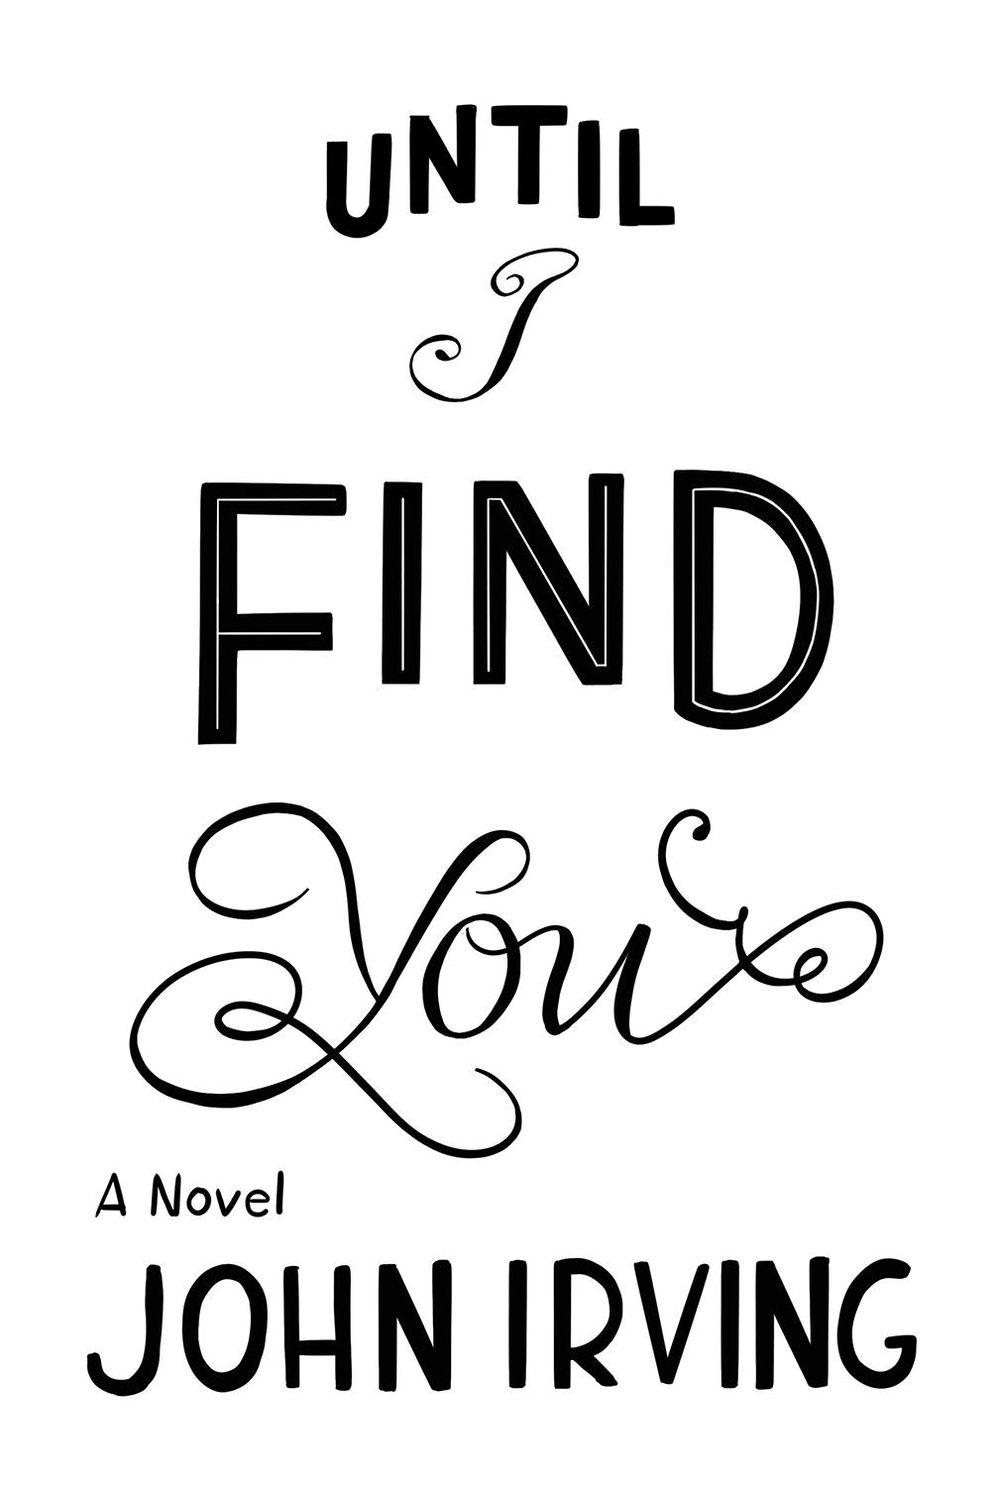 Until I find you - John Irving - image 8 - student project